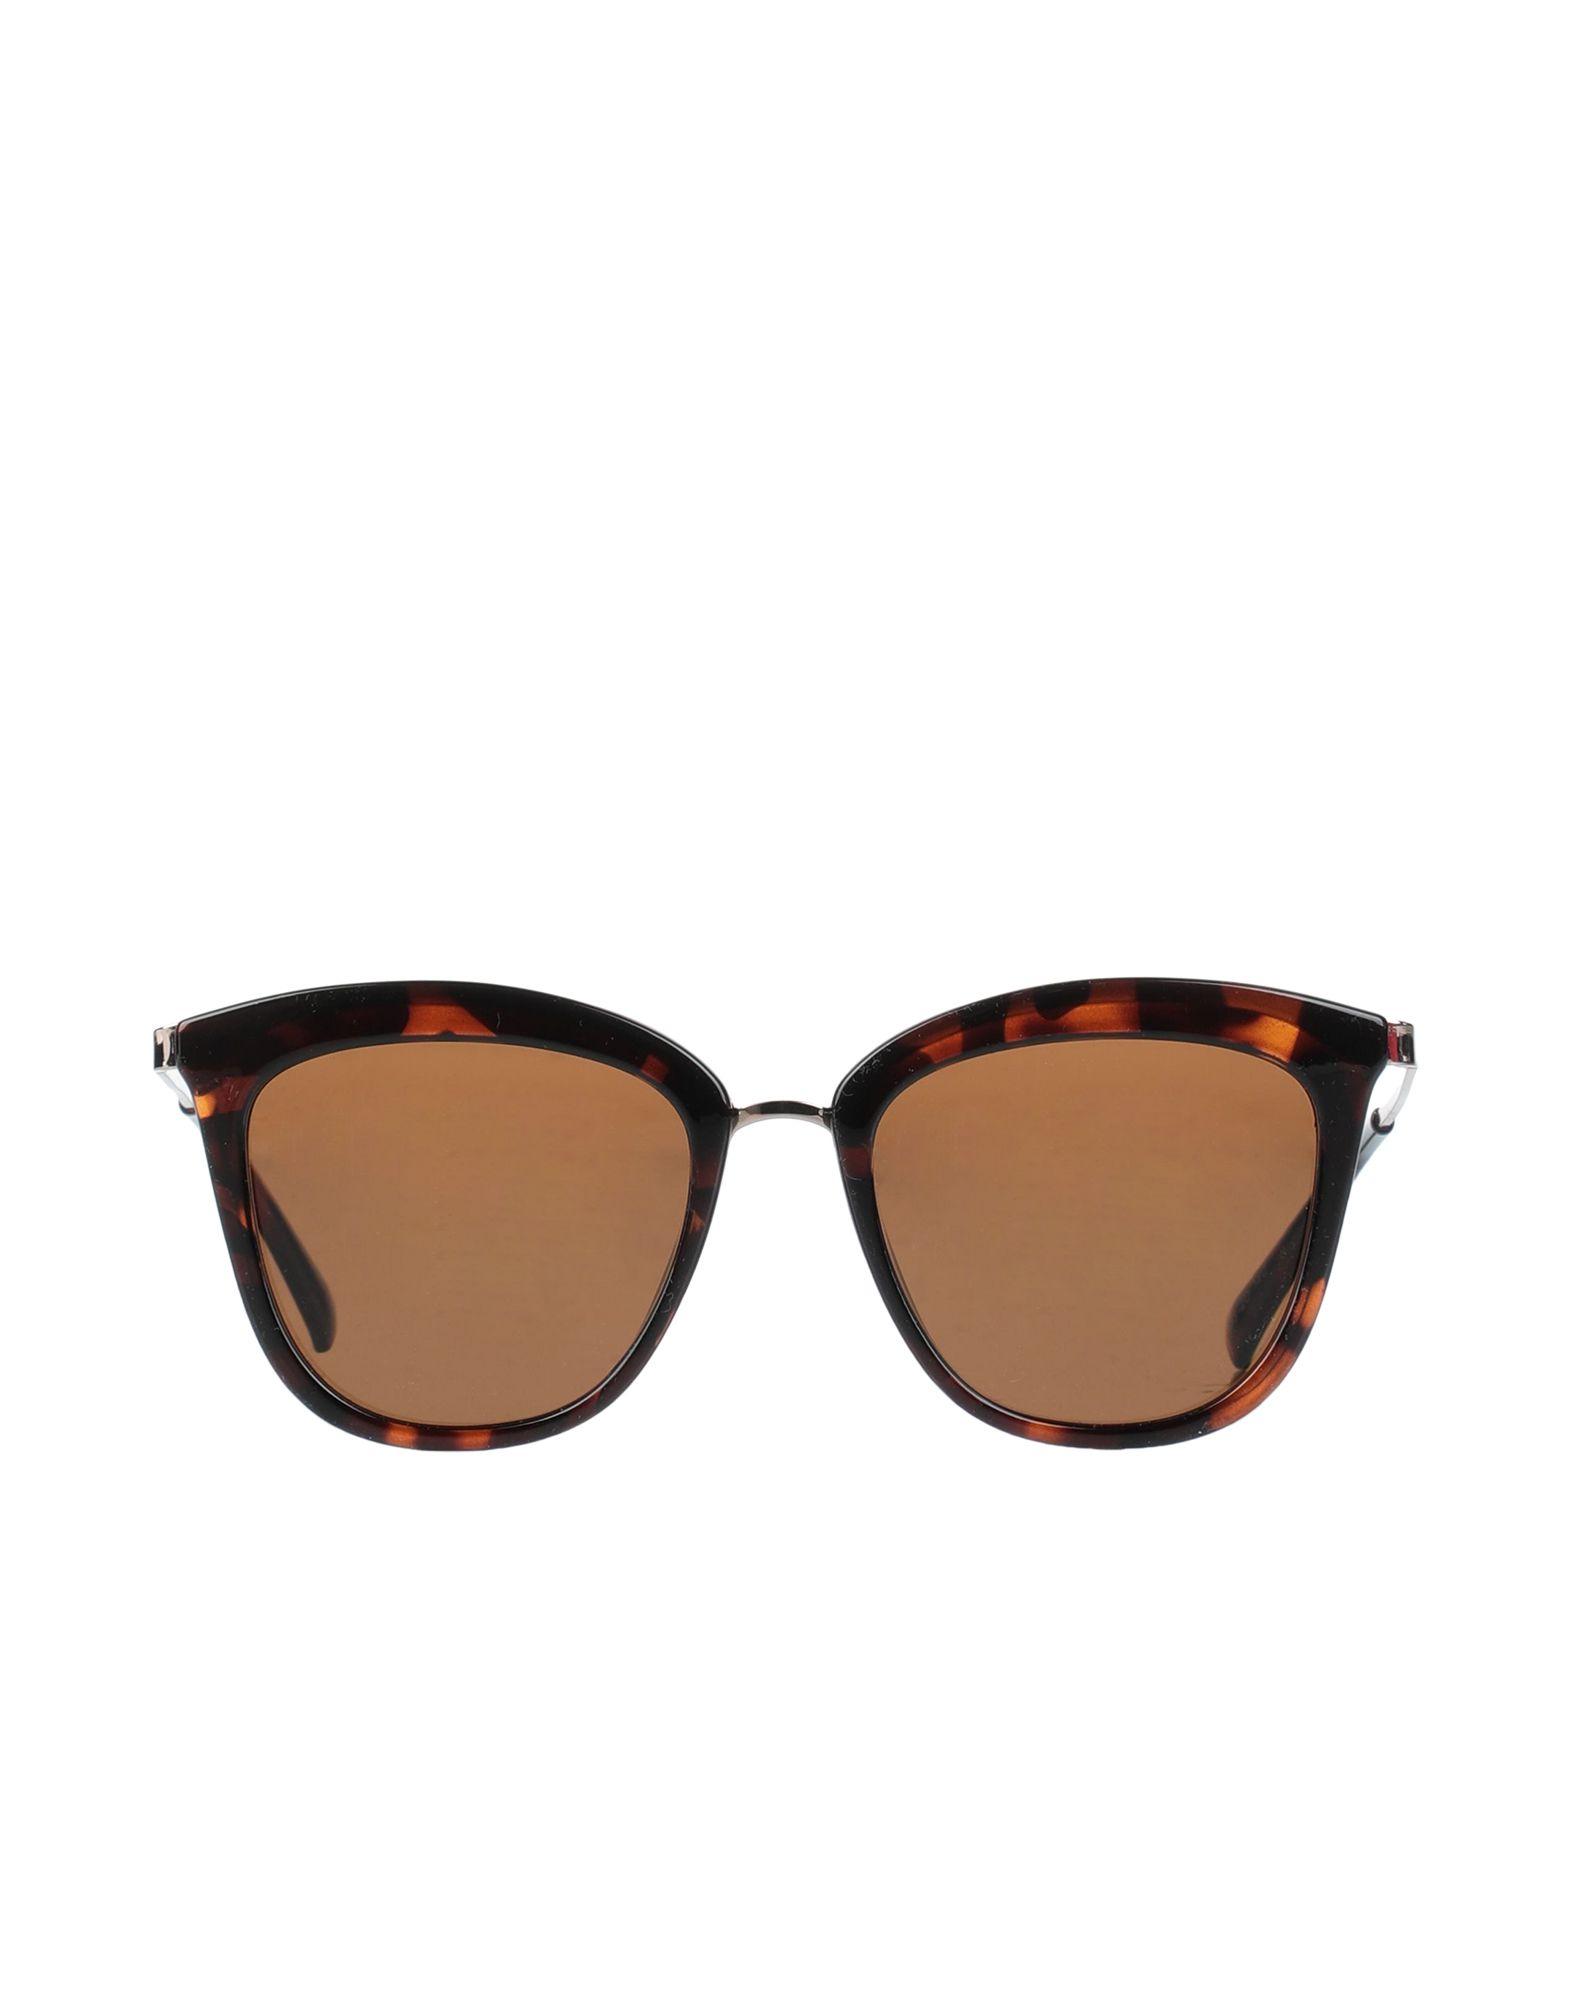 LE SPECS Солнечные очки очки поляризационные cafa france кафа франц cf919